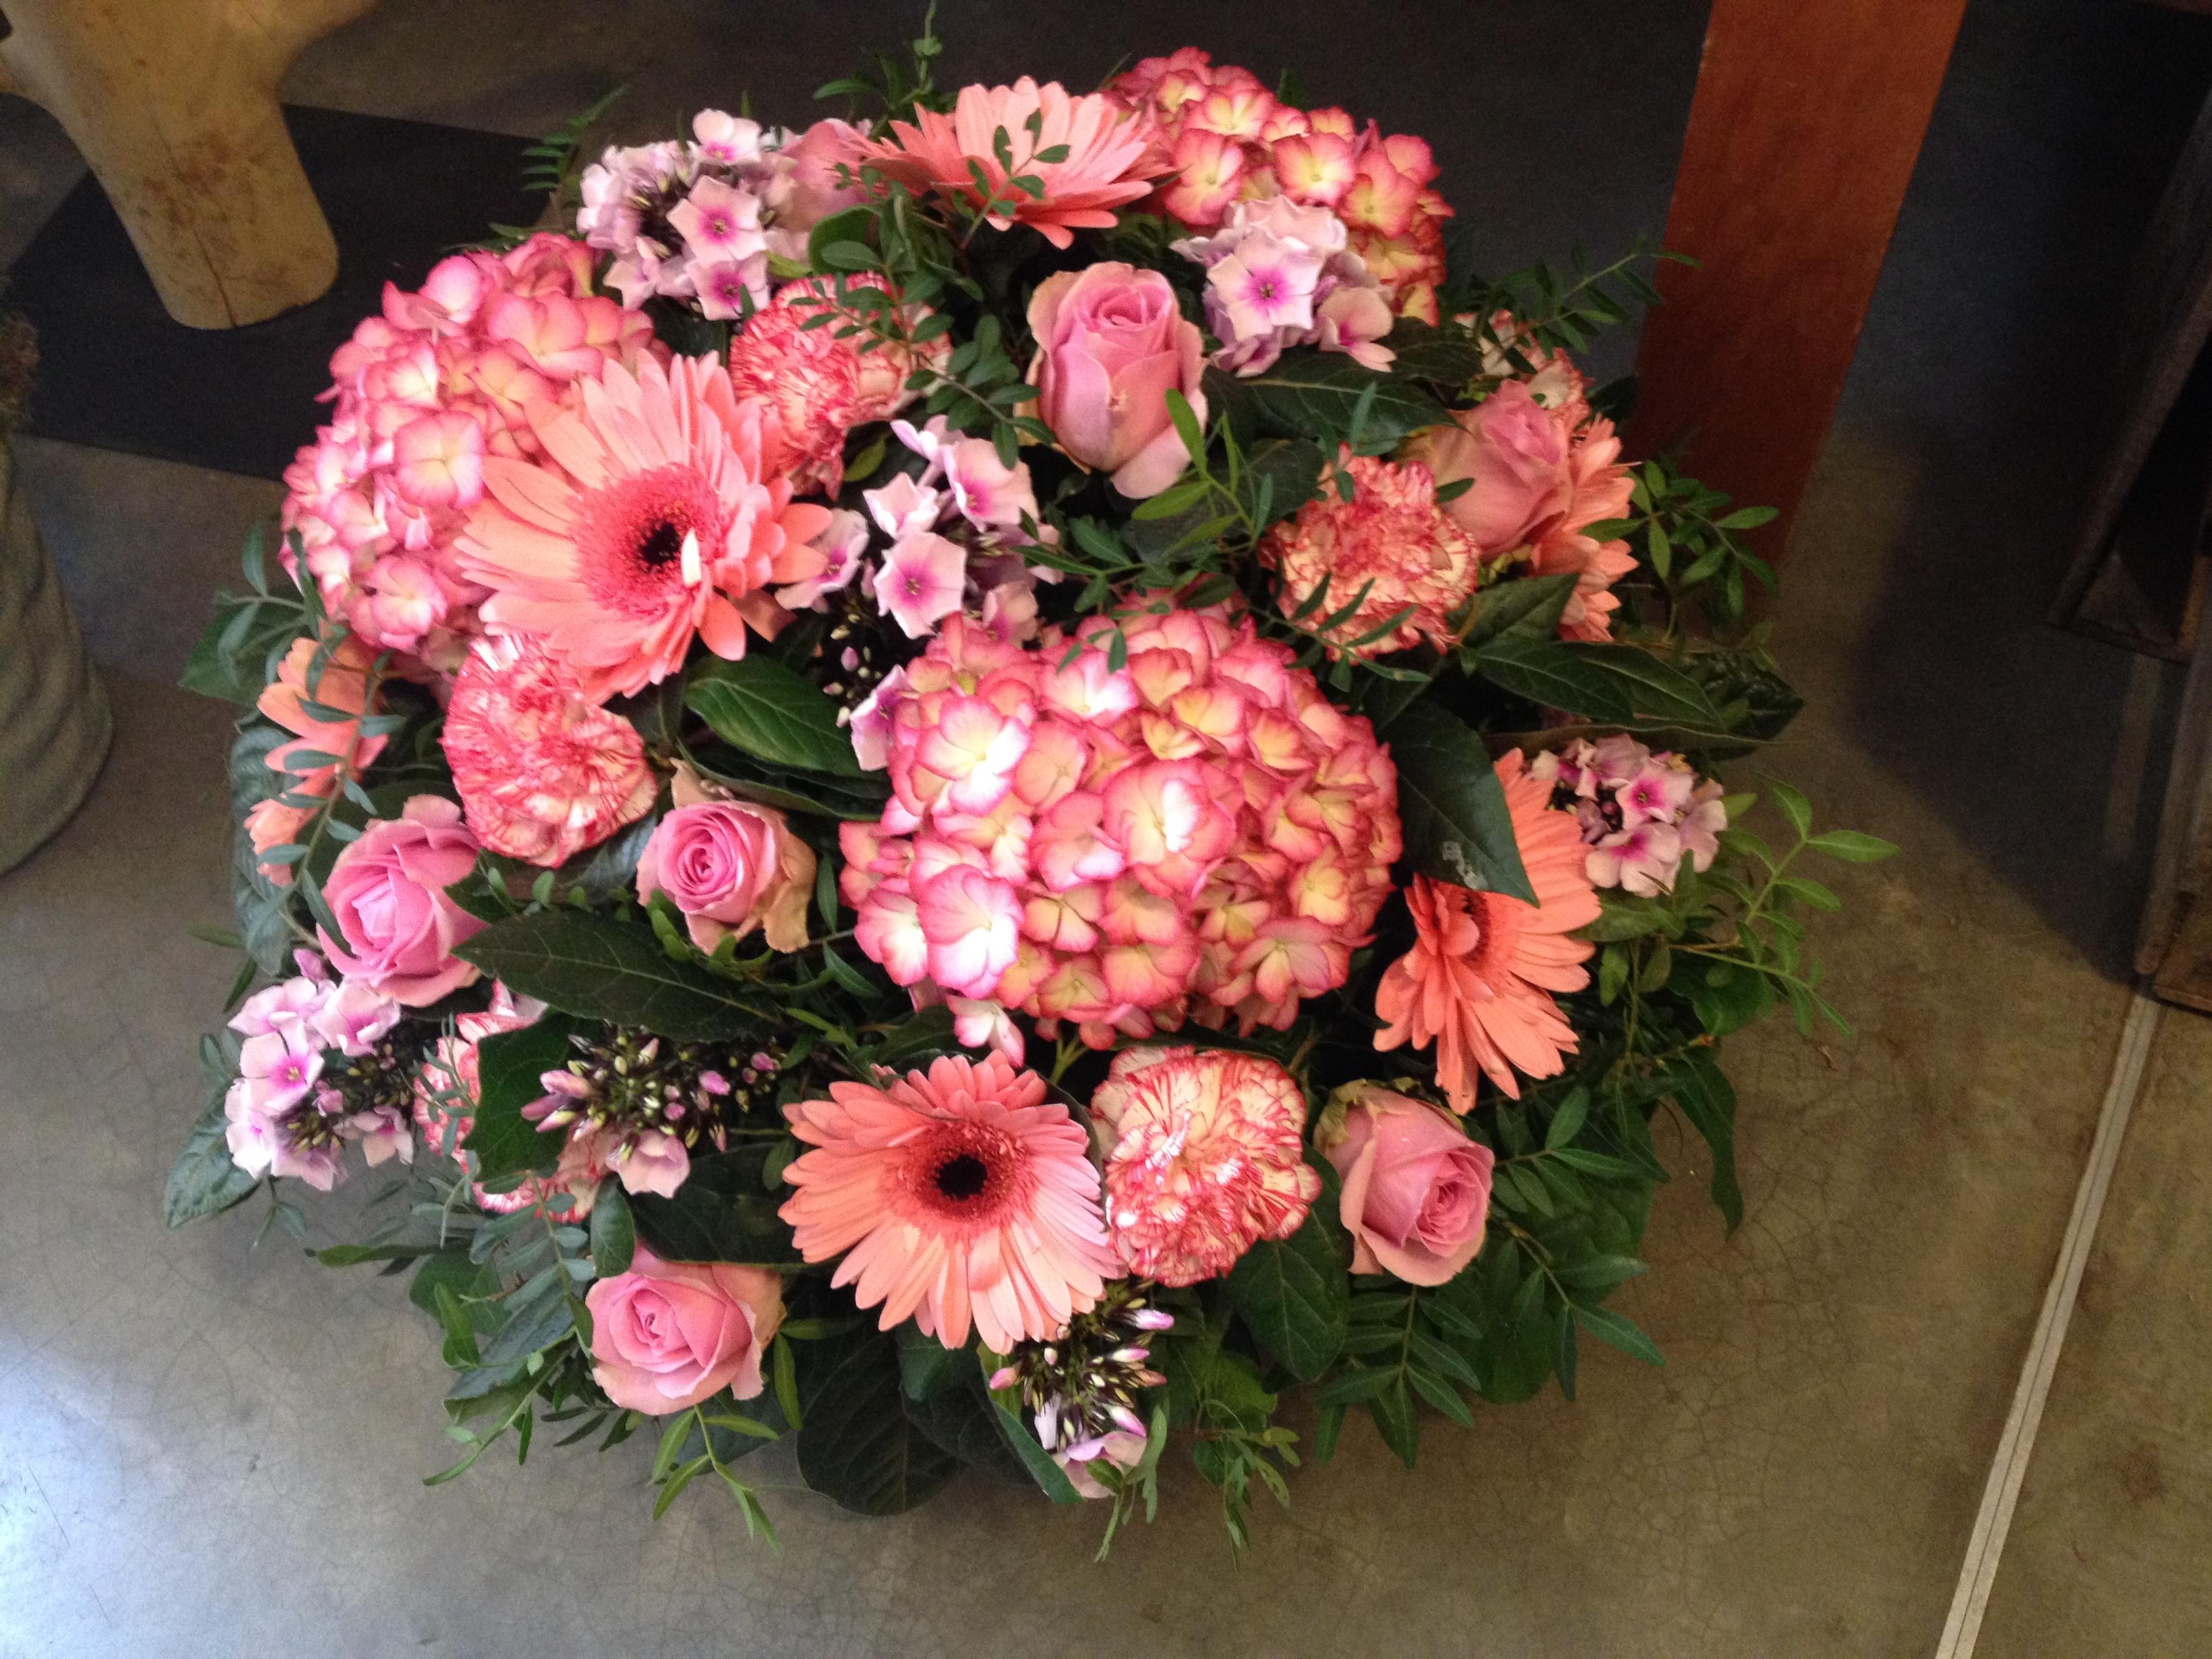 Coussin de deuil hotensias gerberas roses phlox Marlies Fleurs fleuriste Nimes